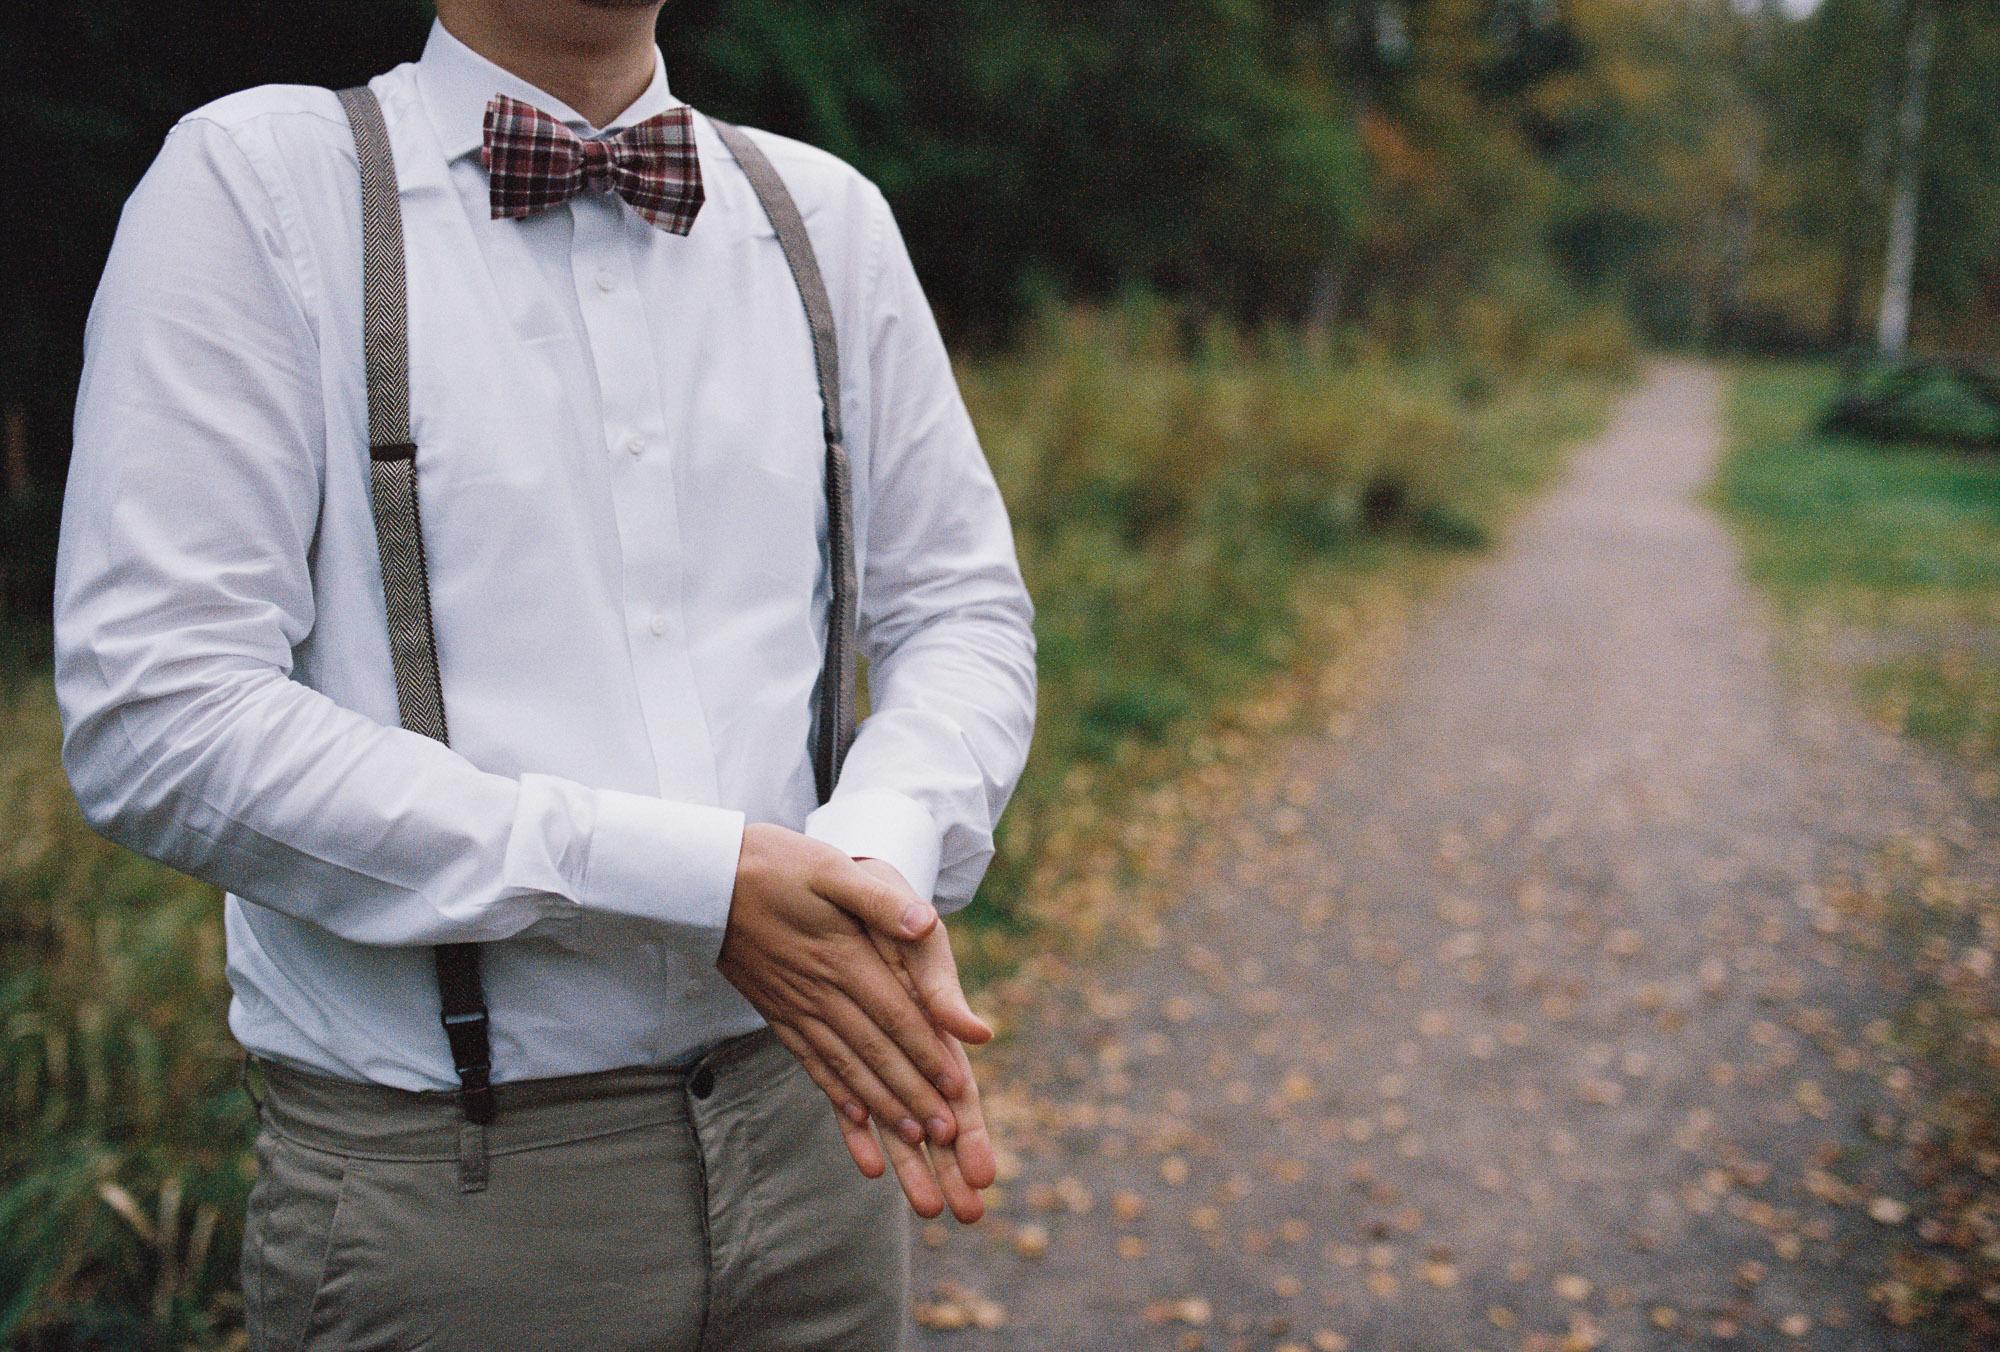 jere-satamo-analog-film-wedding-photographer-finland-057.jpg